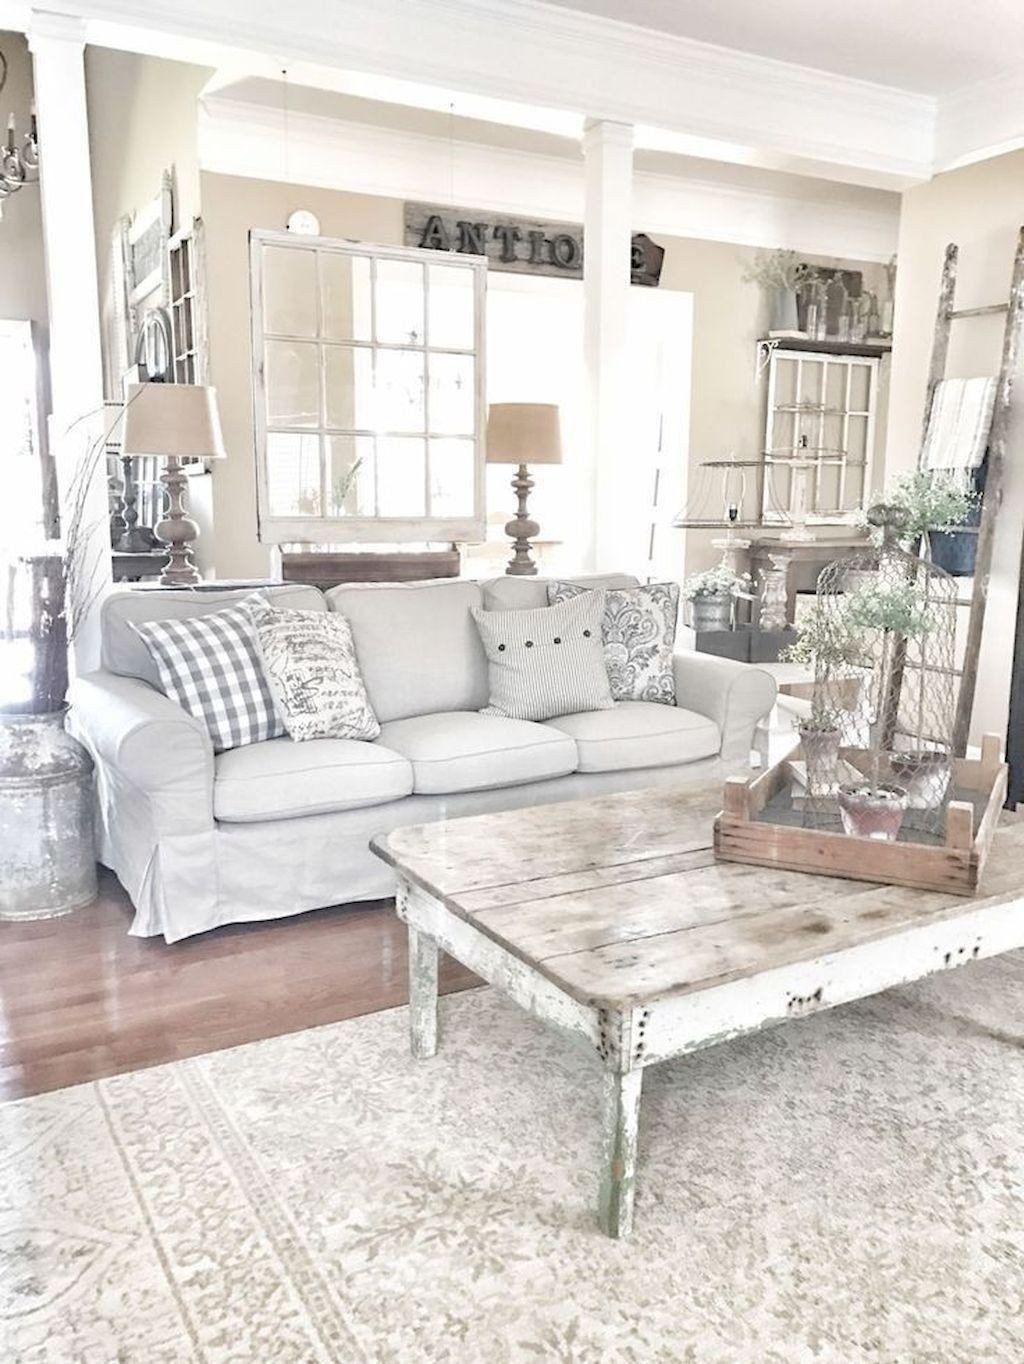 30 Modern Farmhouse Living Room Decor Dekorasi Ruang Keluarga Ide Dekorasi Rumah Set Ruang Keluarga